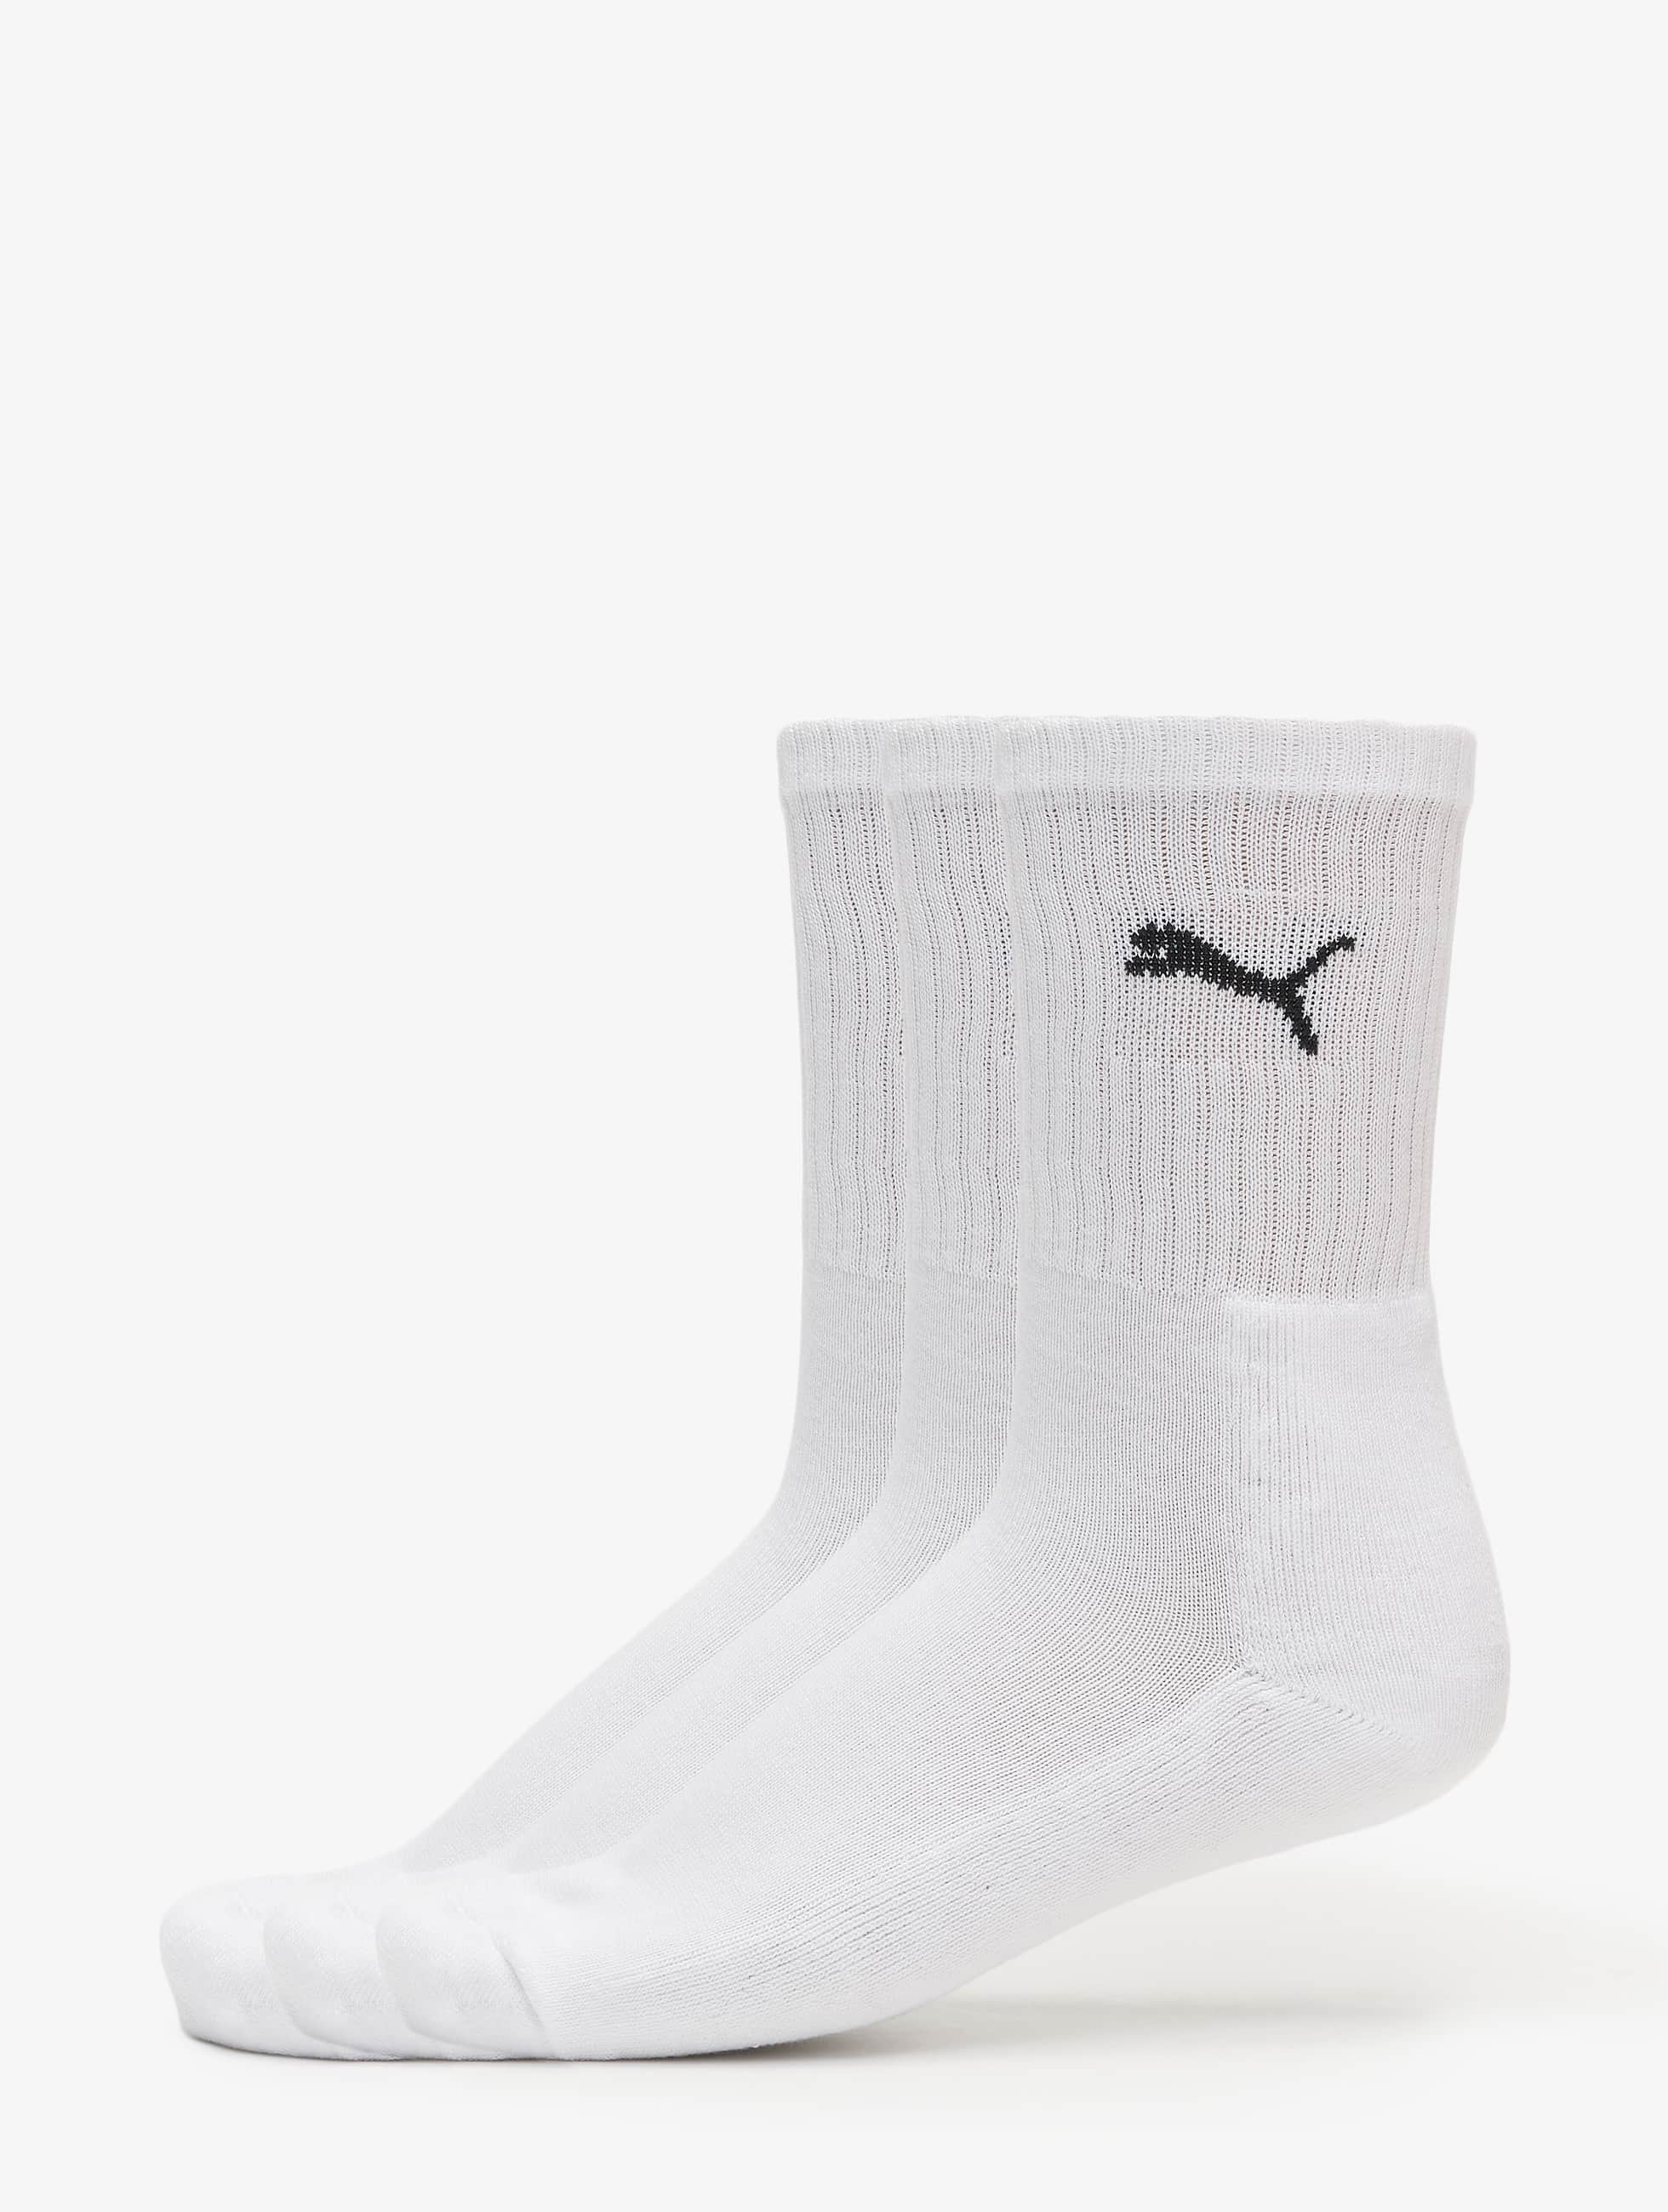 Puma Chaussettes 3-Pack Sport blanc